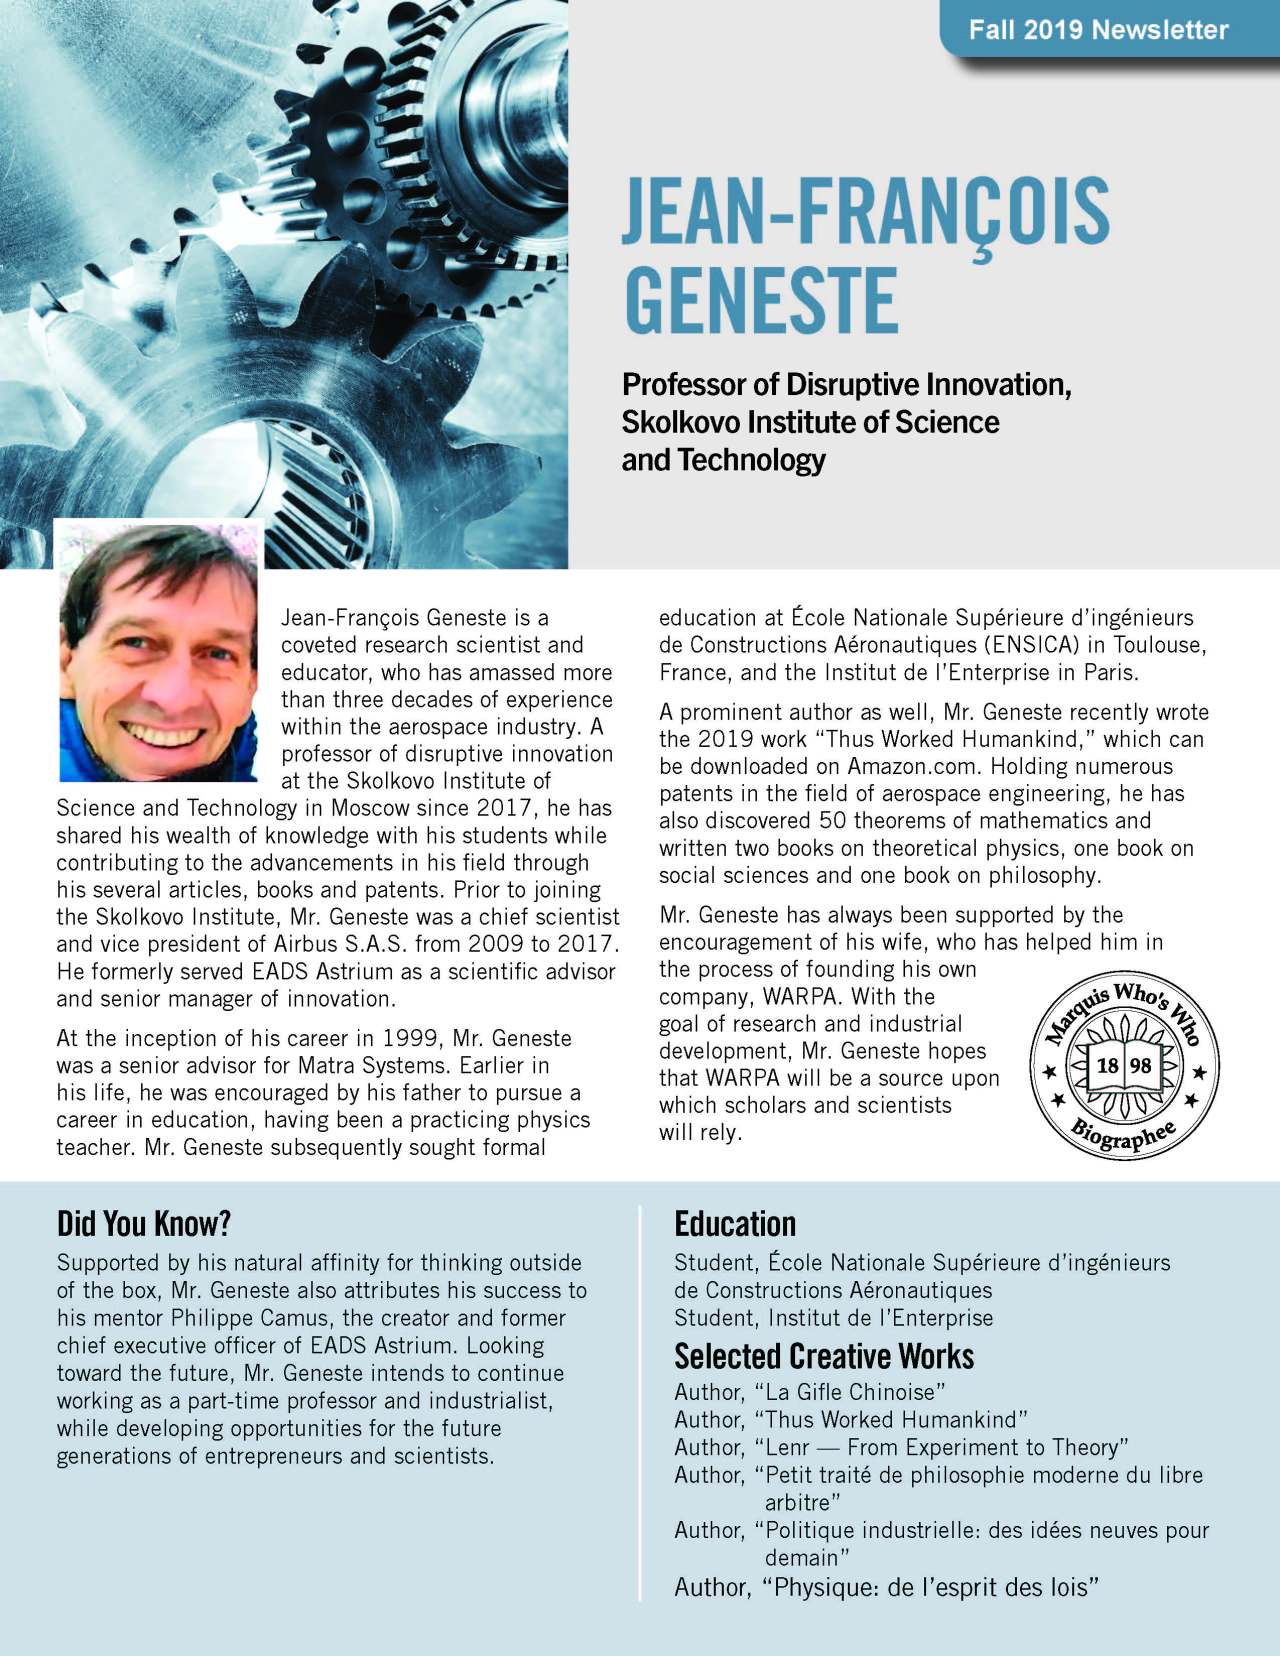 Geneste, Jean-Francois 3679577_4003679577 Newsletter